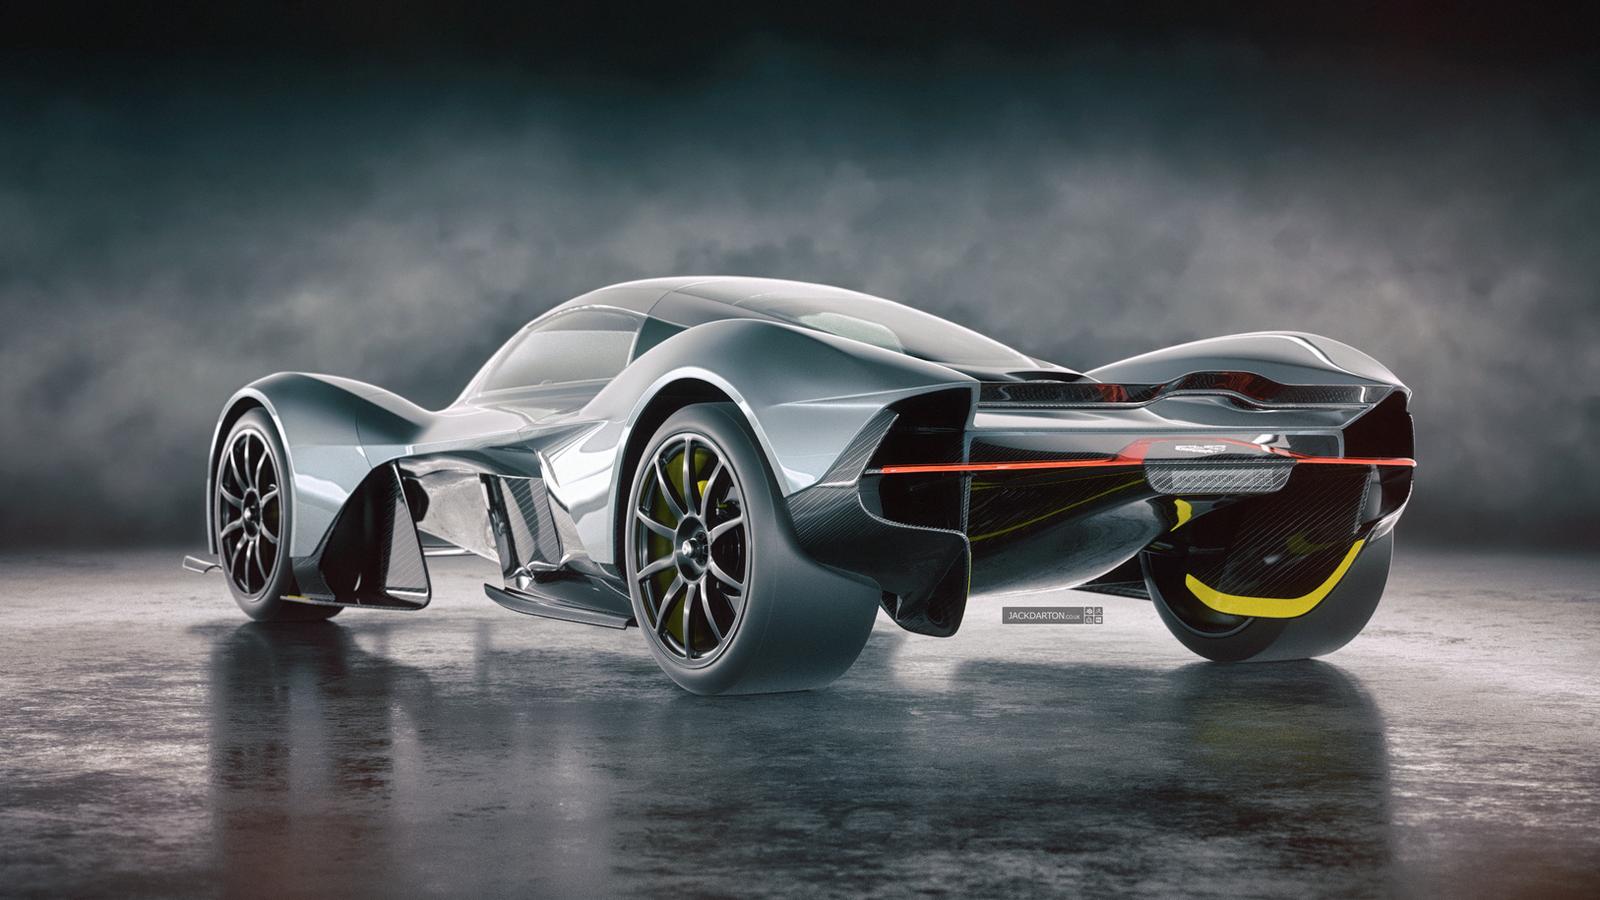 Aston Martin Used Car Add News Of New Car - Napleton aston martin